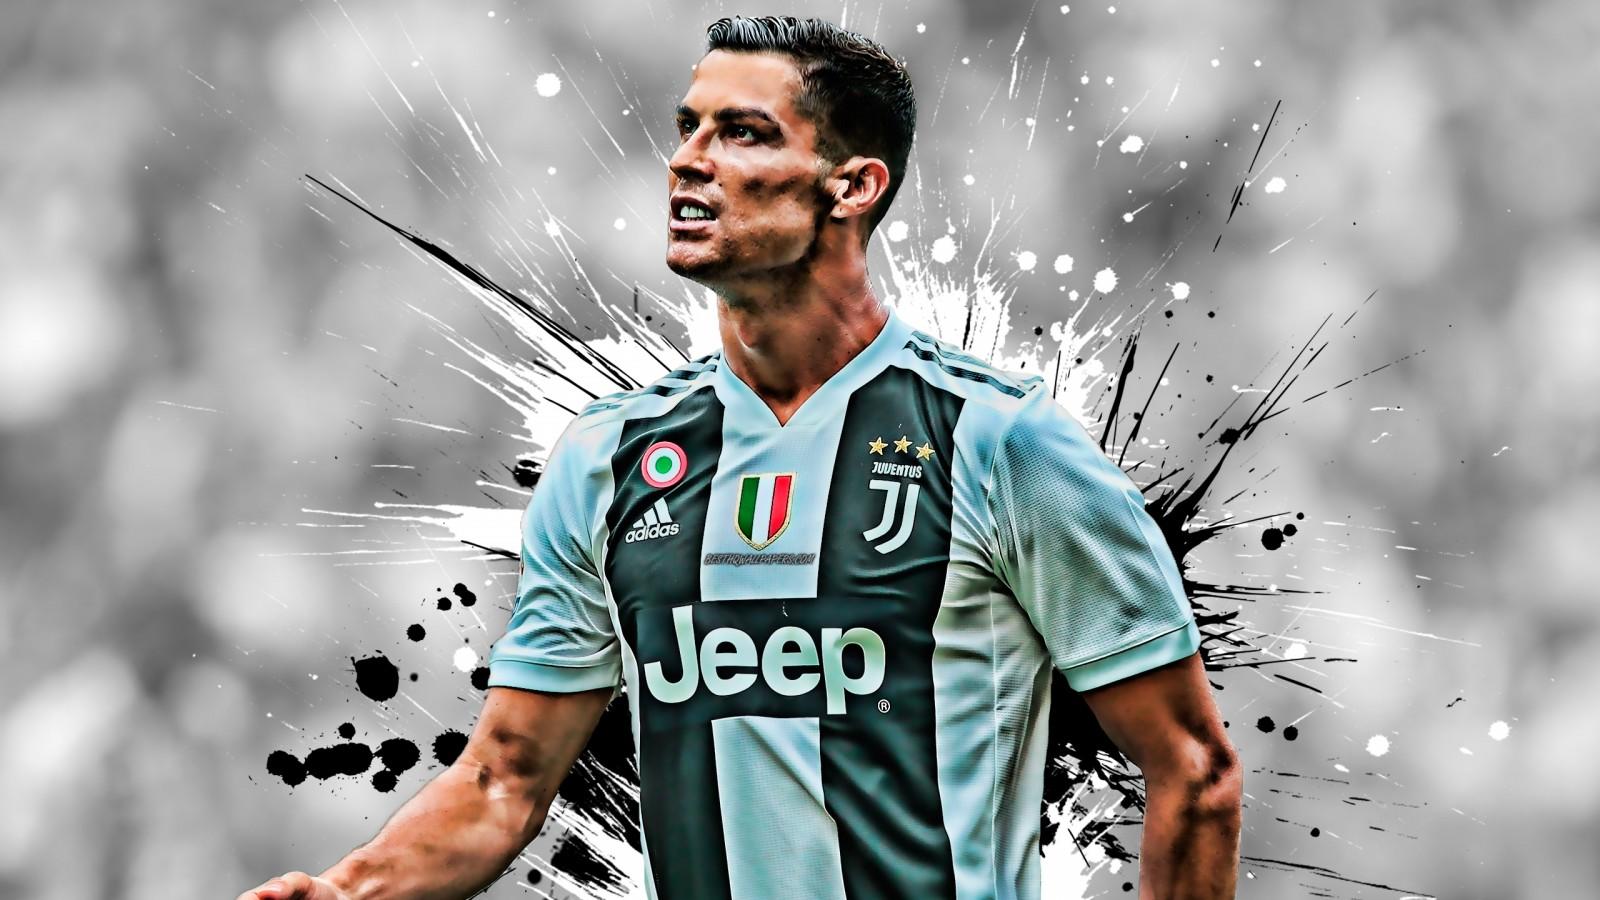 Windows 7 Wallpaper Hd 3d For Desktop Cristiano Ronaldo Wallpapers Hd Wallpapers Id 27455